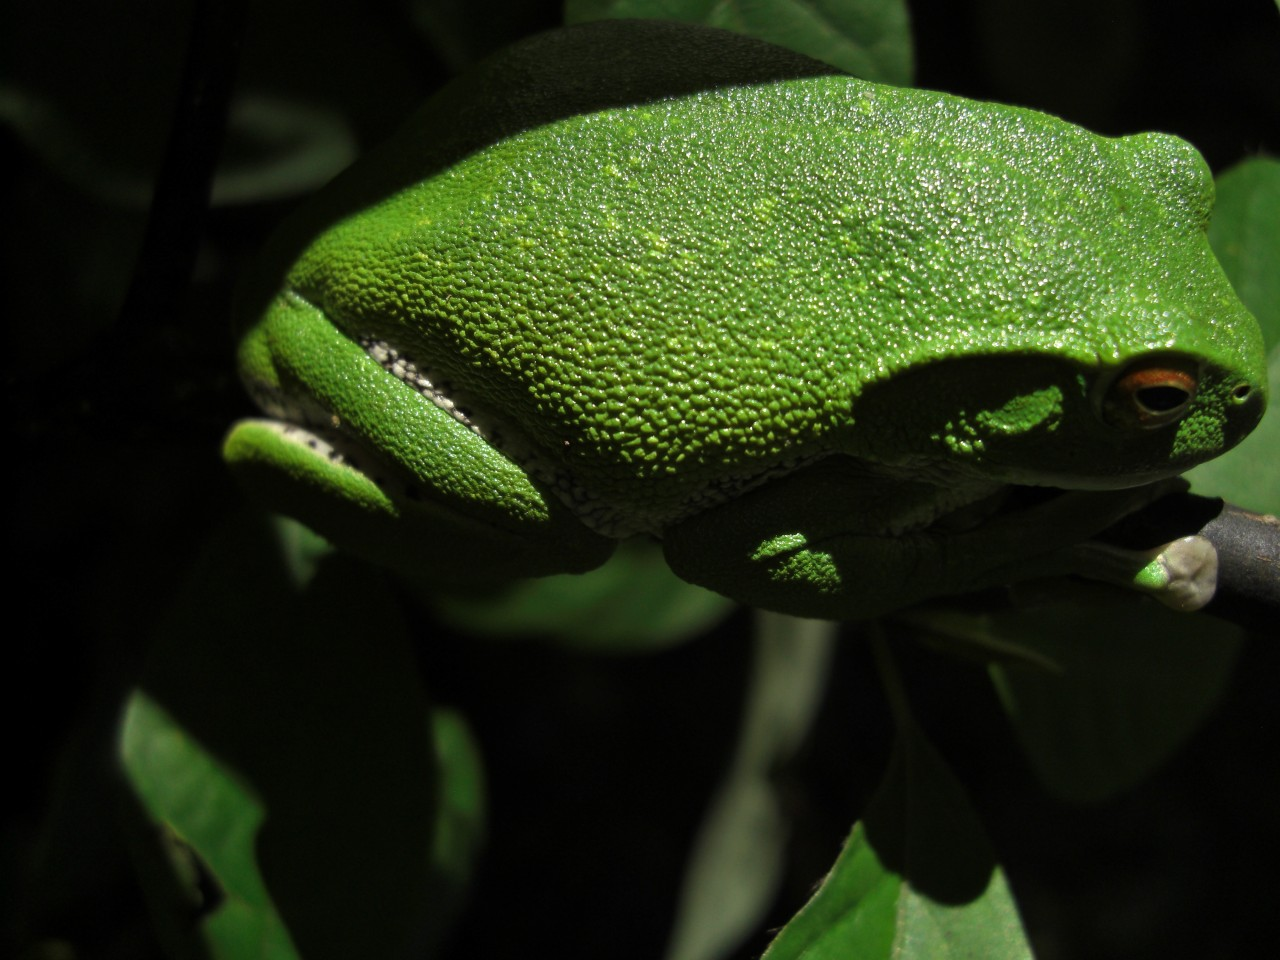 青森 生物 カエル 蛙 両生類